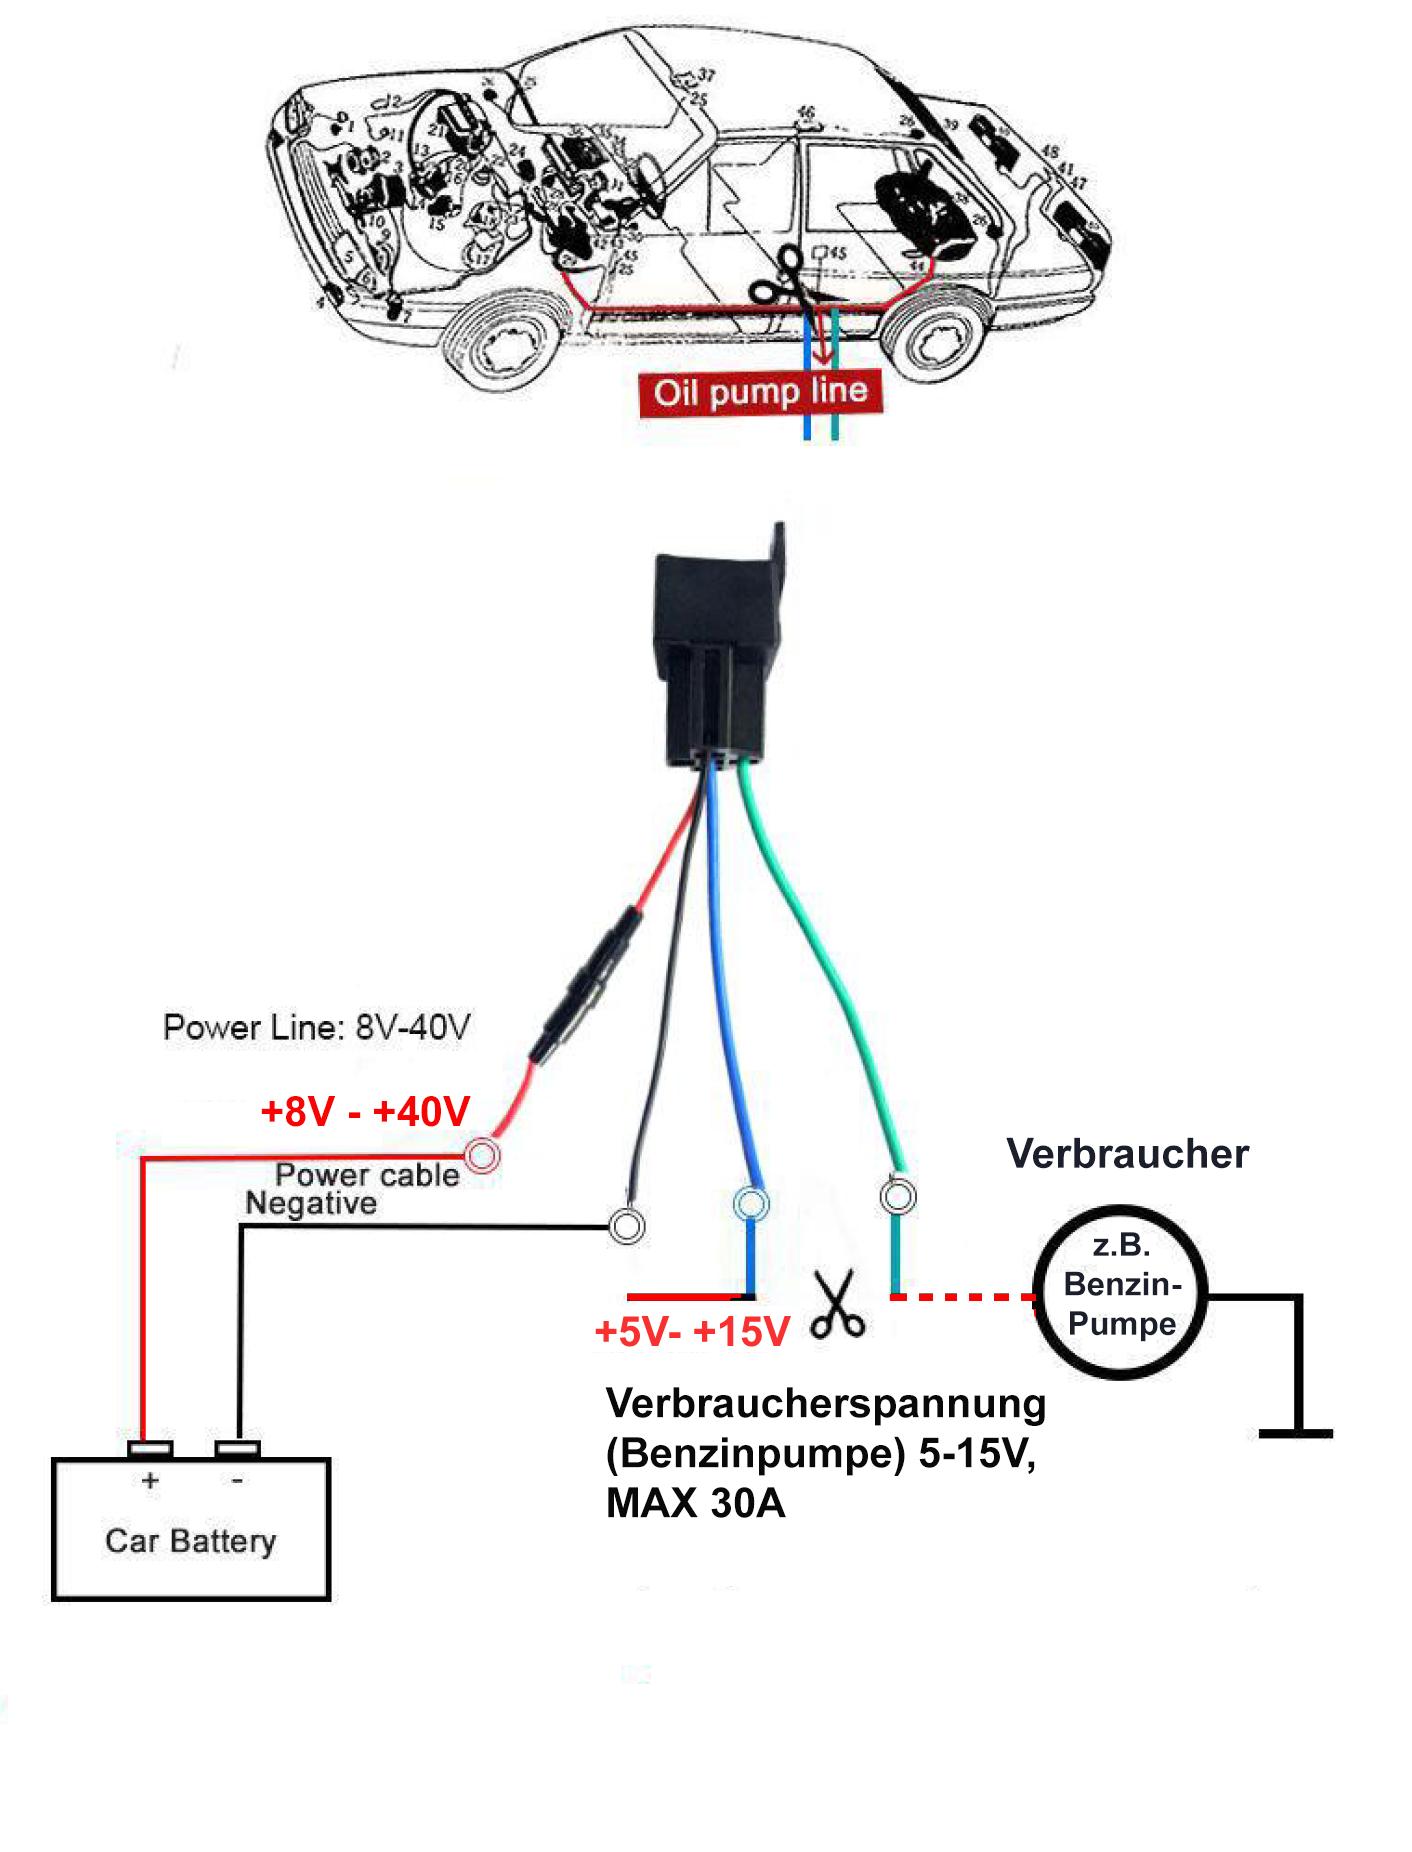 "TRACY-TS Sofortstartpaket ""TRACK & STOP"", GPS Tracker mit Wegfahrsperre"